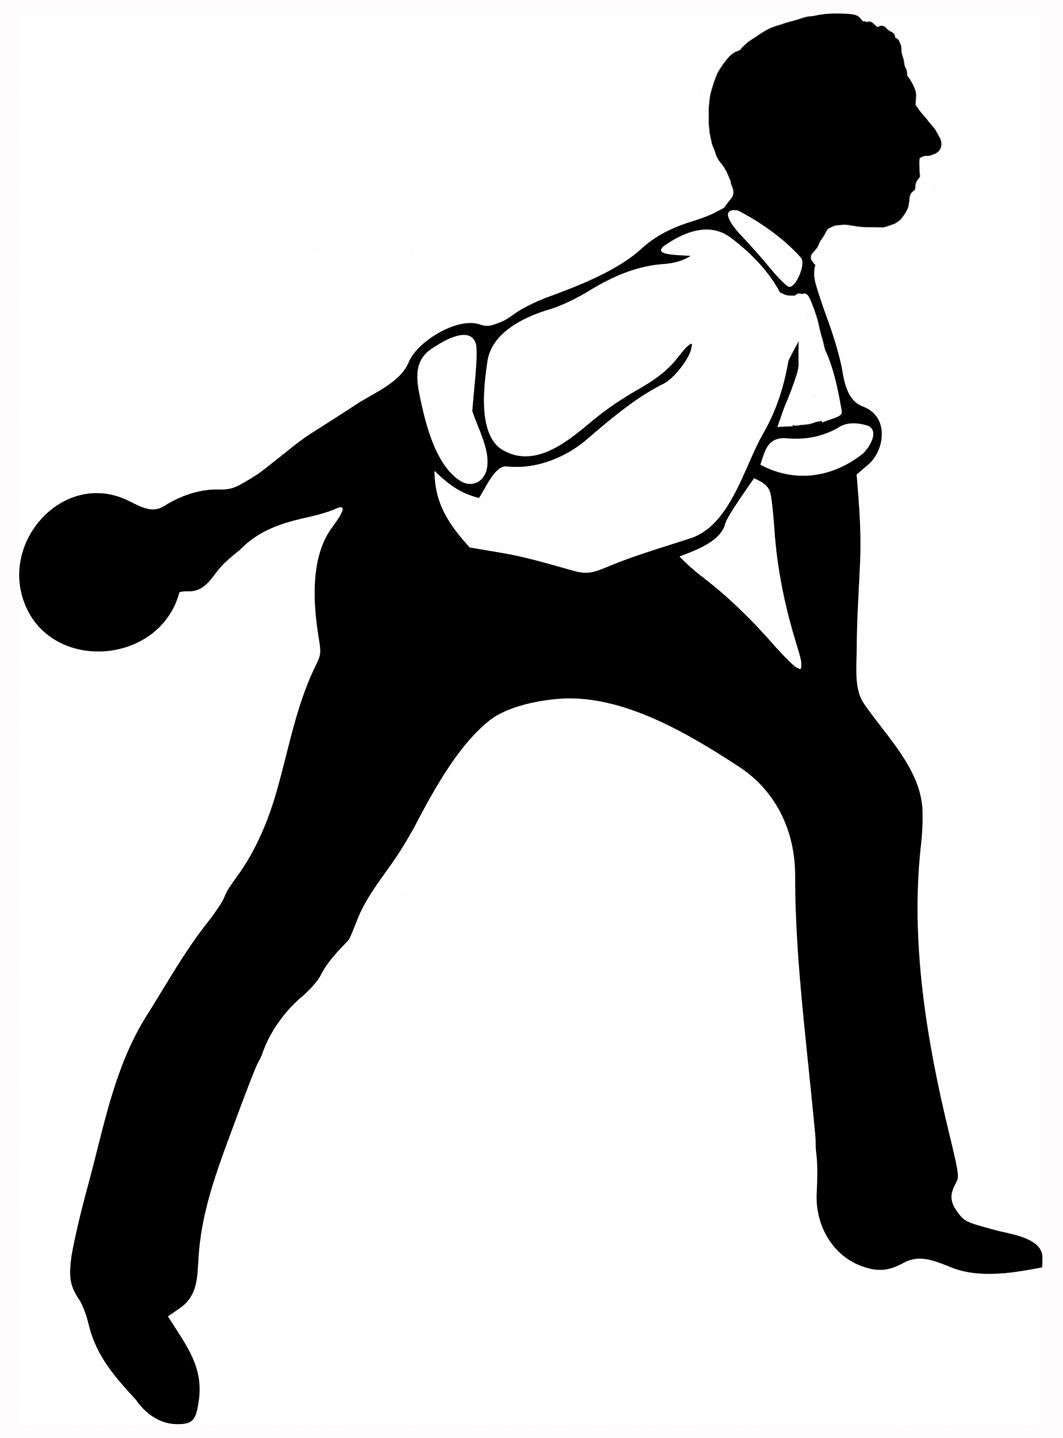 bowling silhouette man shirtsleeves